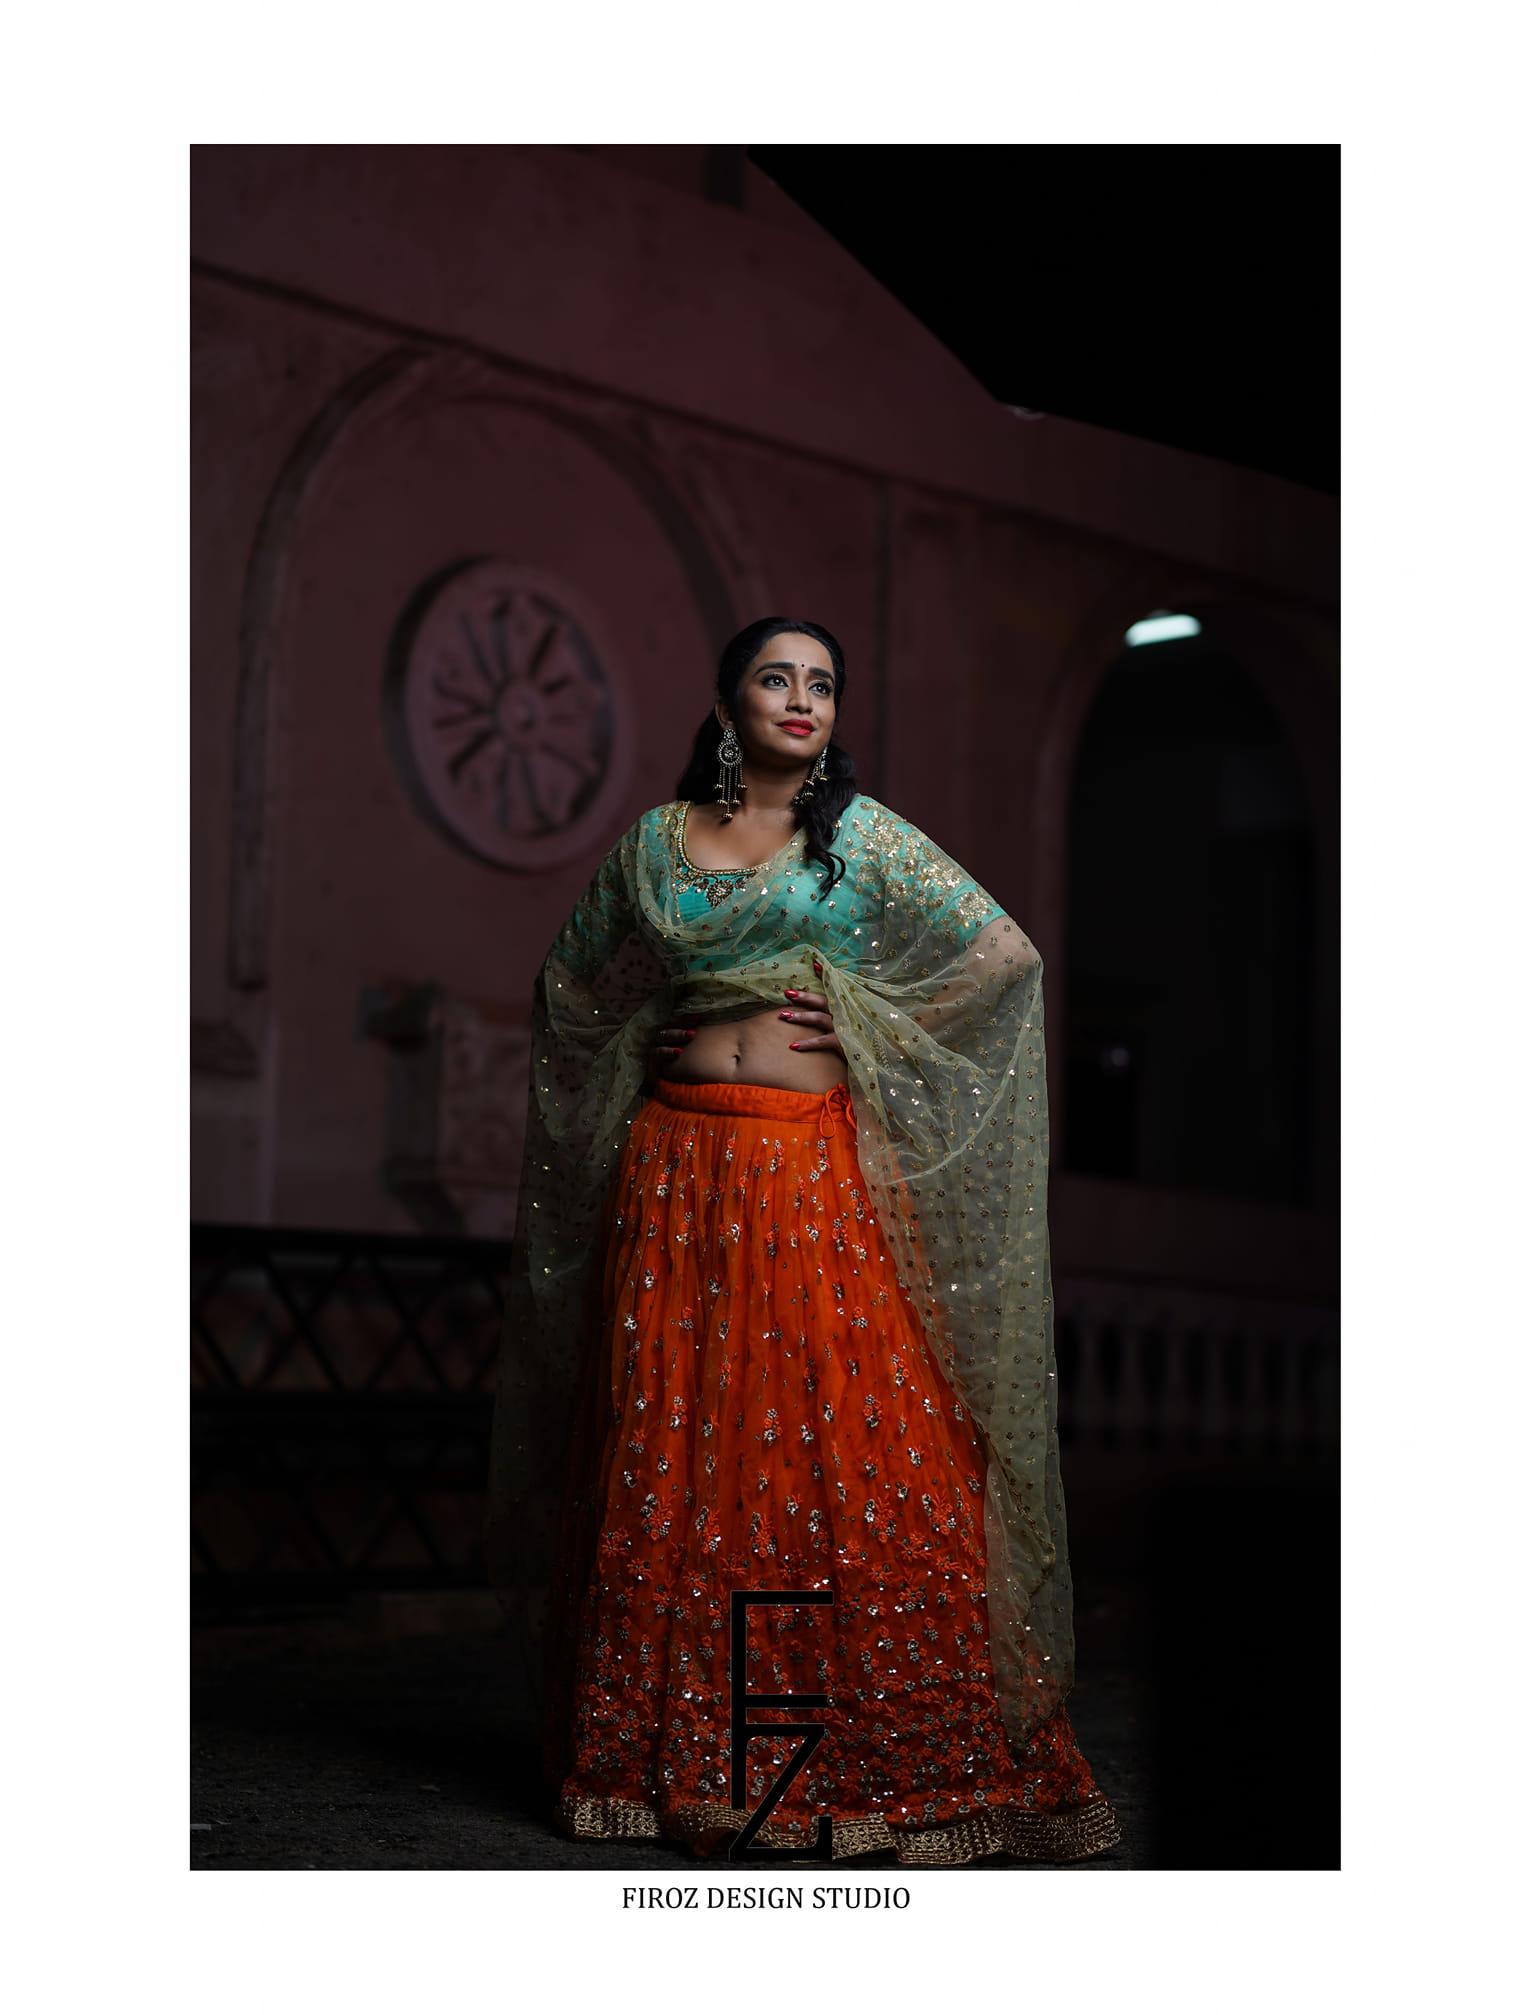 Beautiful and Charming Vindhya Vishaka in Firoz Design Studio Outfit. 2021-01-12